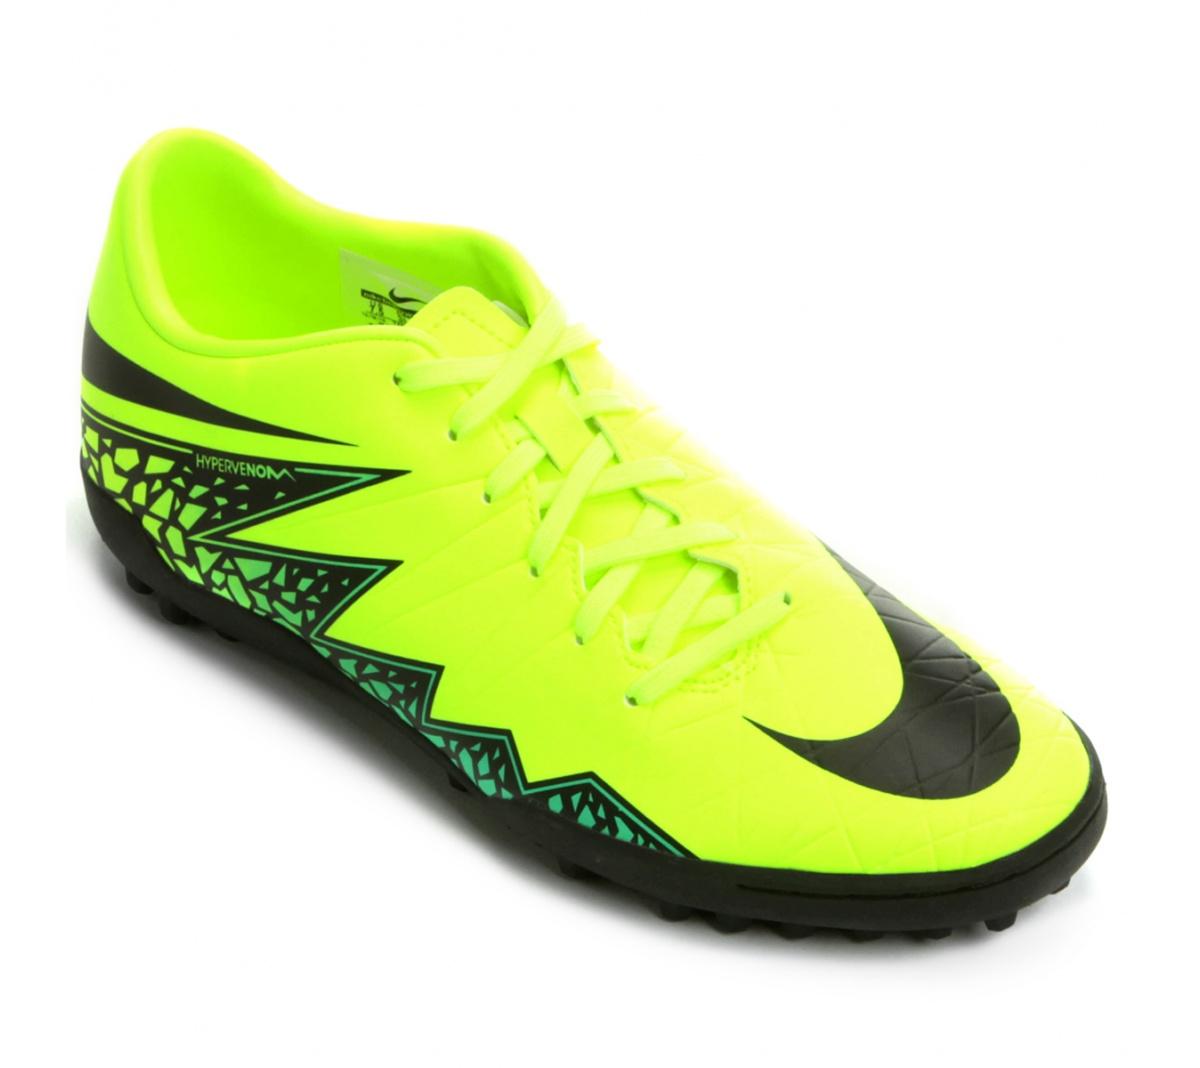 1b2091cae3db8 Chuteira Nike Hypervenom Phelon II TF Verde Limão com Preto - Mundo ...